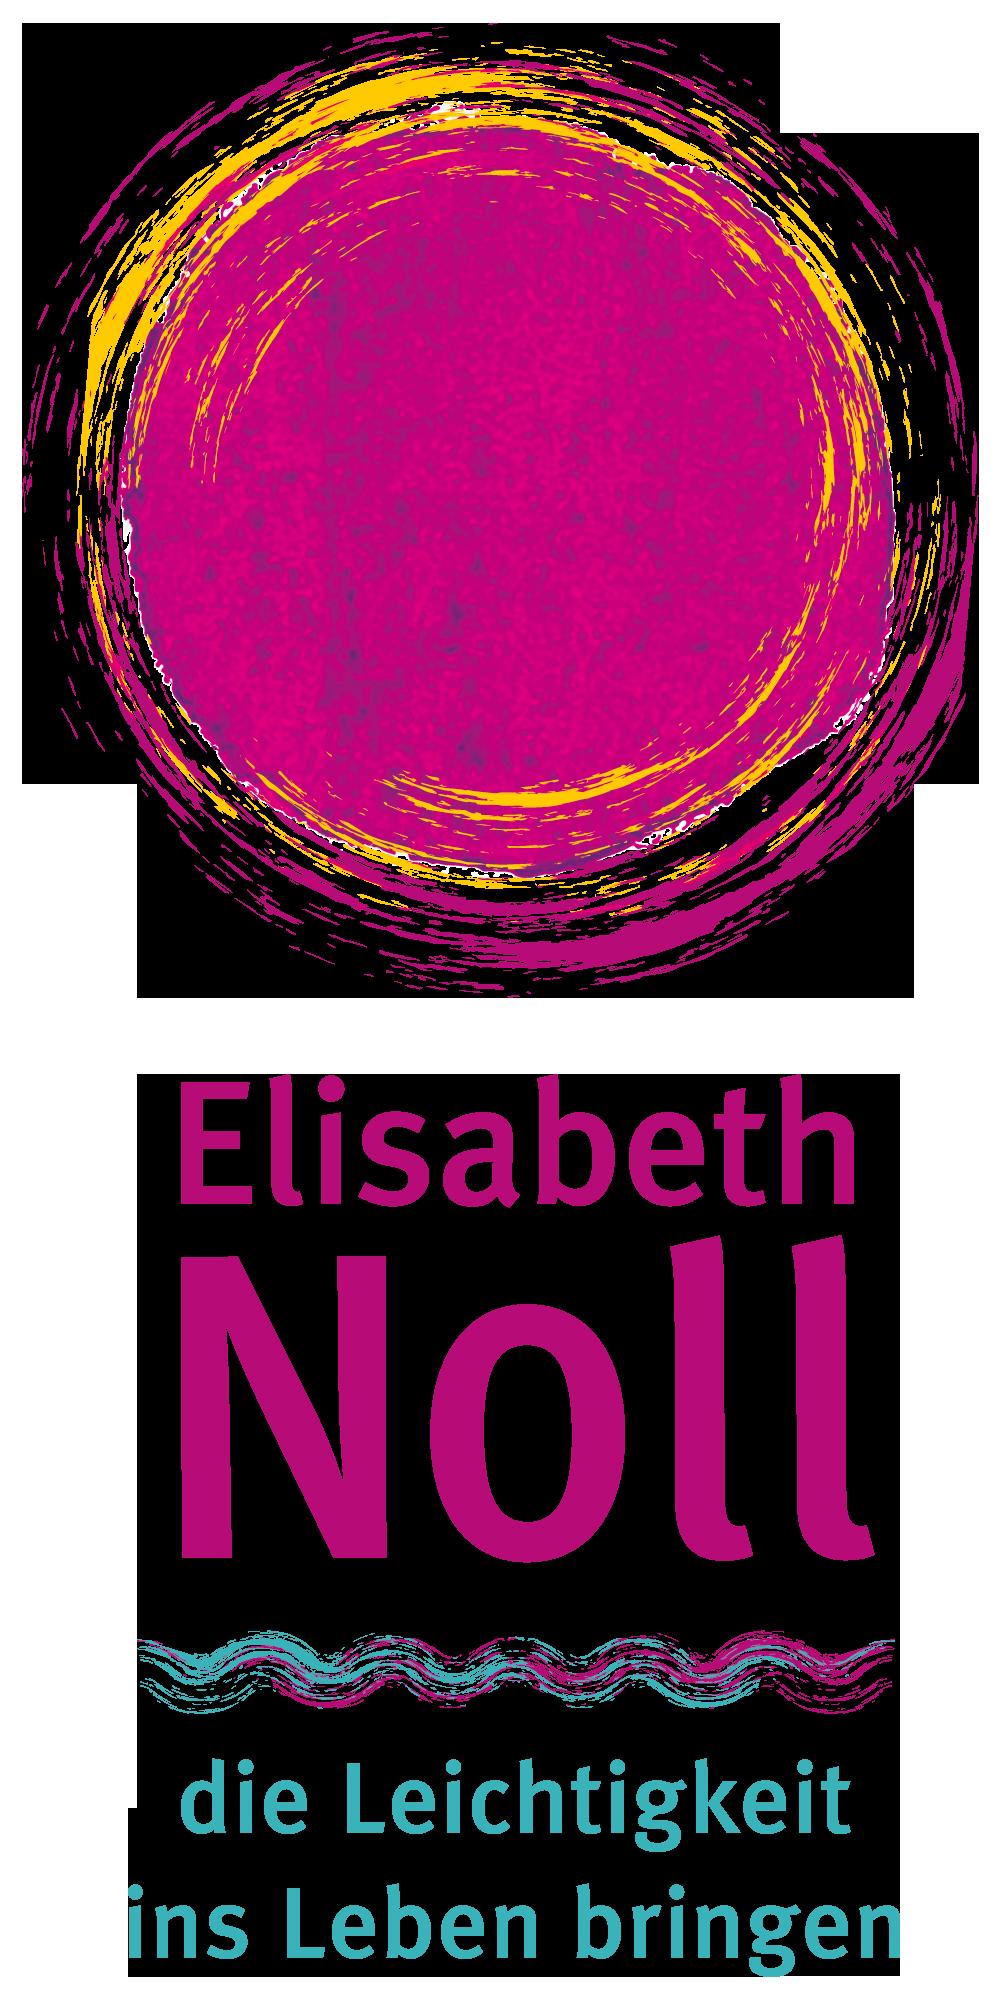 Elisabeth Noll Logo